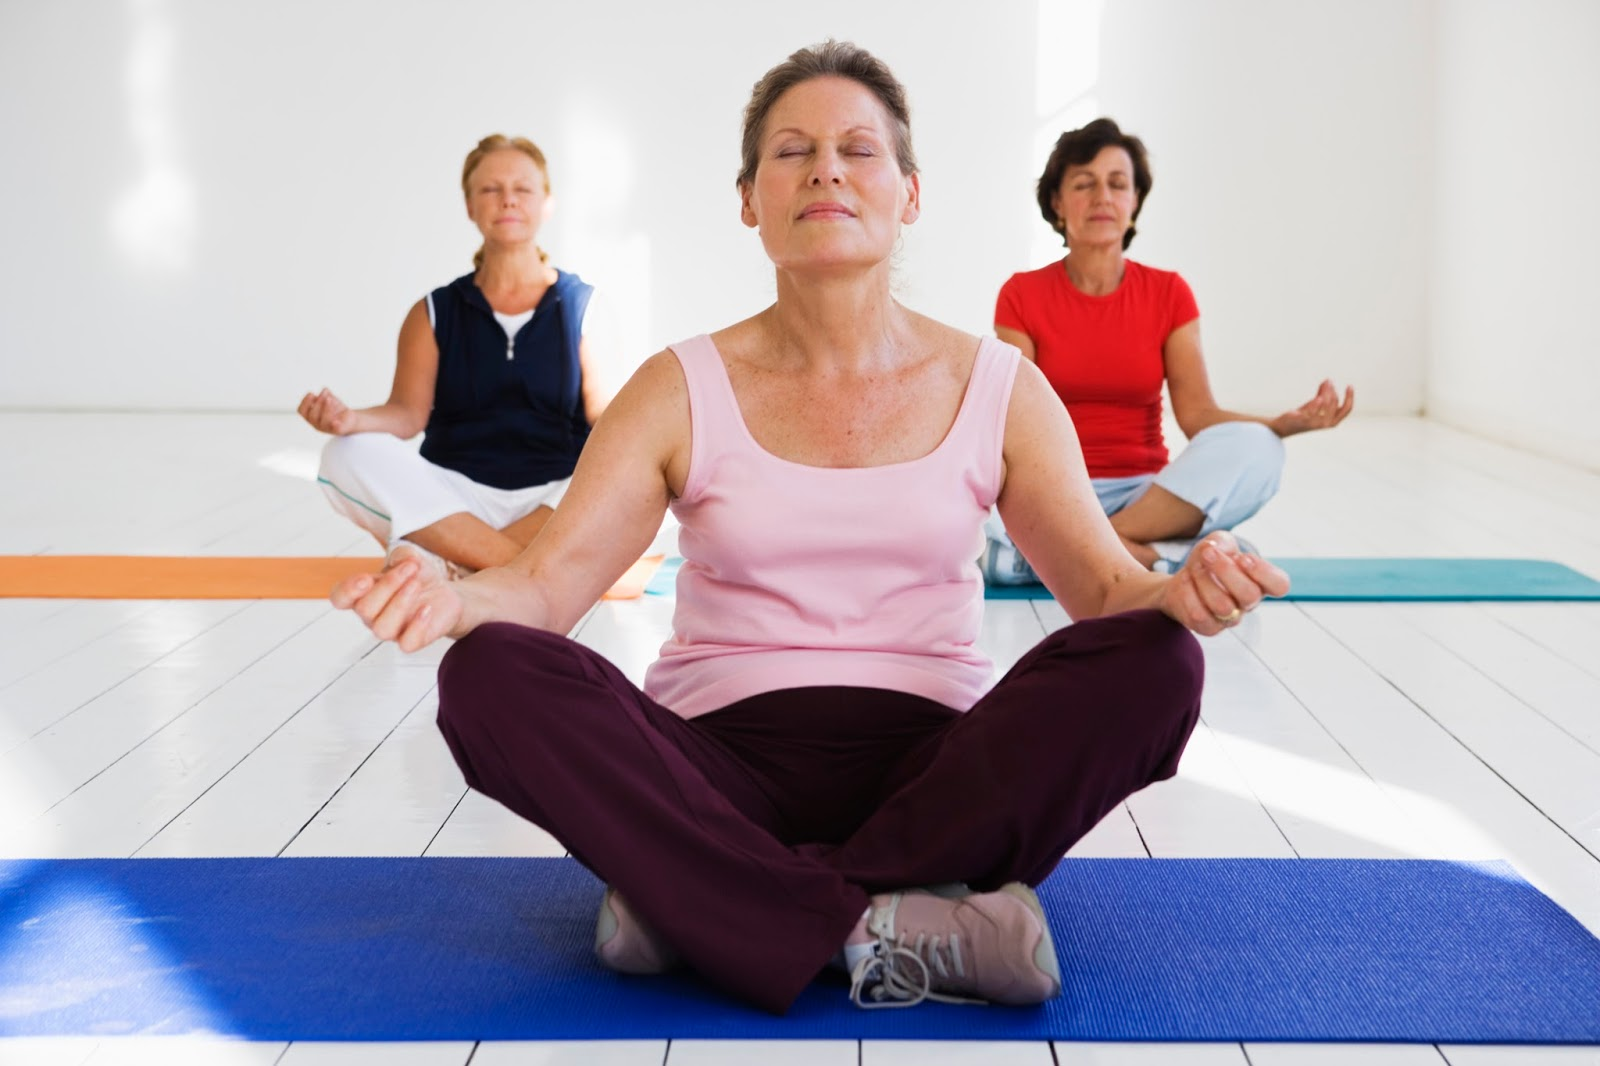 yoga%2B%25C3%25A0%2Bl%2527h%25C3%25B4pital%2Bles%2Bbienfaits.jpg